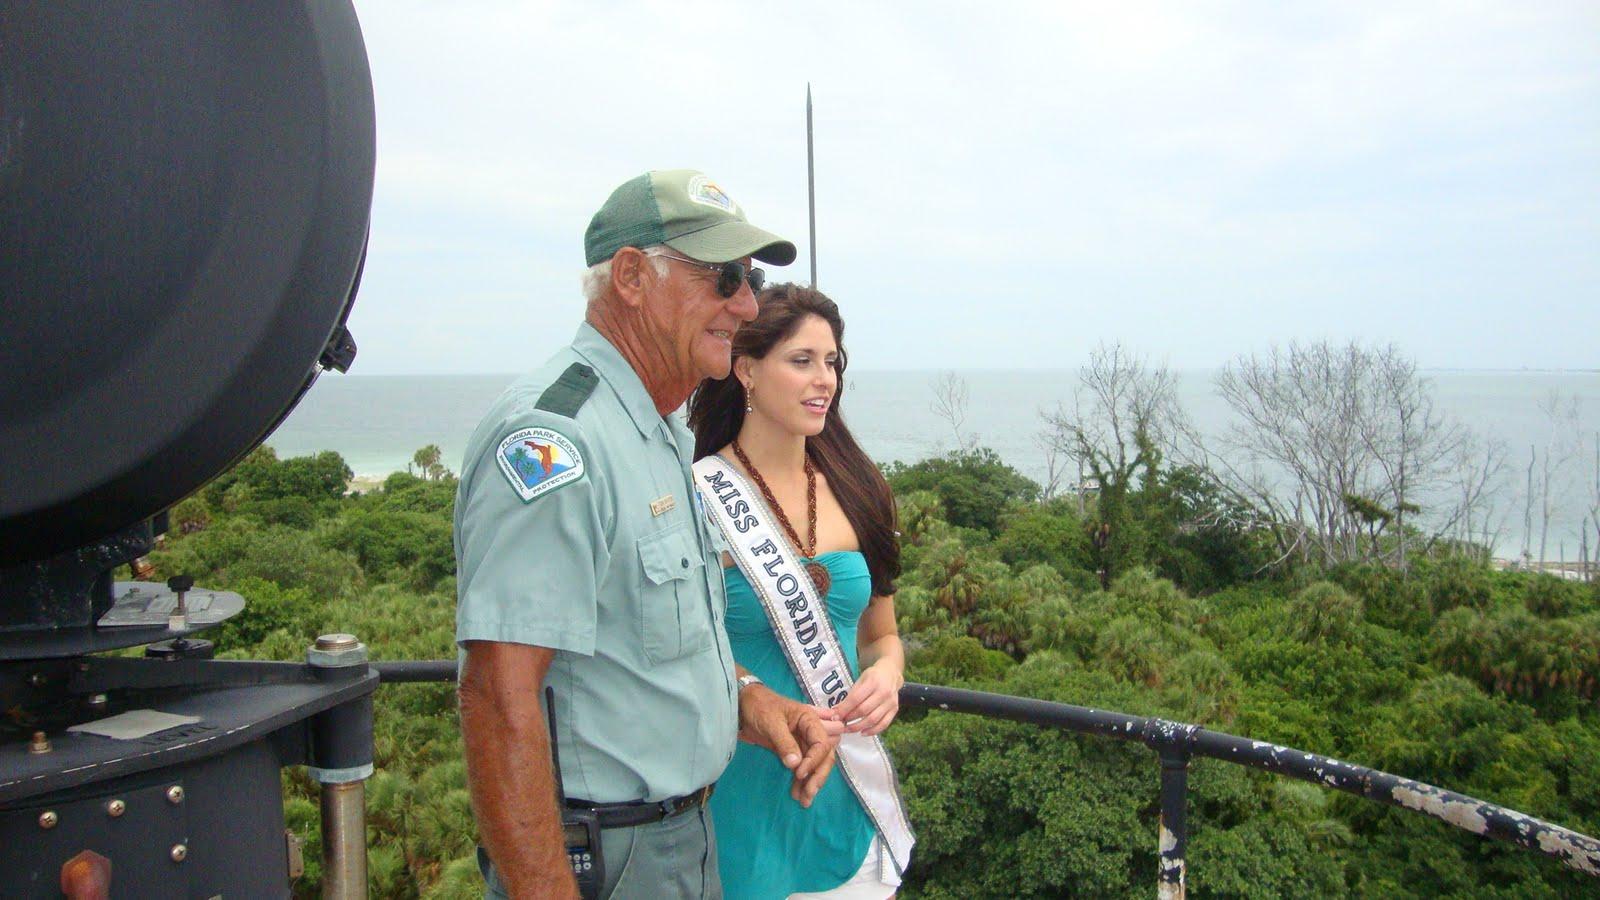 Miss Florida USA 2010 - Megan Clementi DSC01969